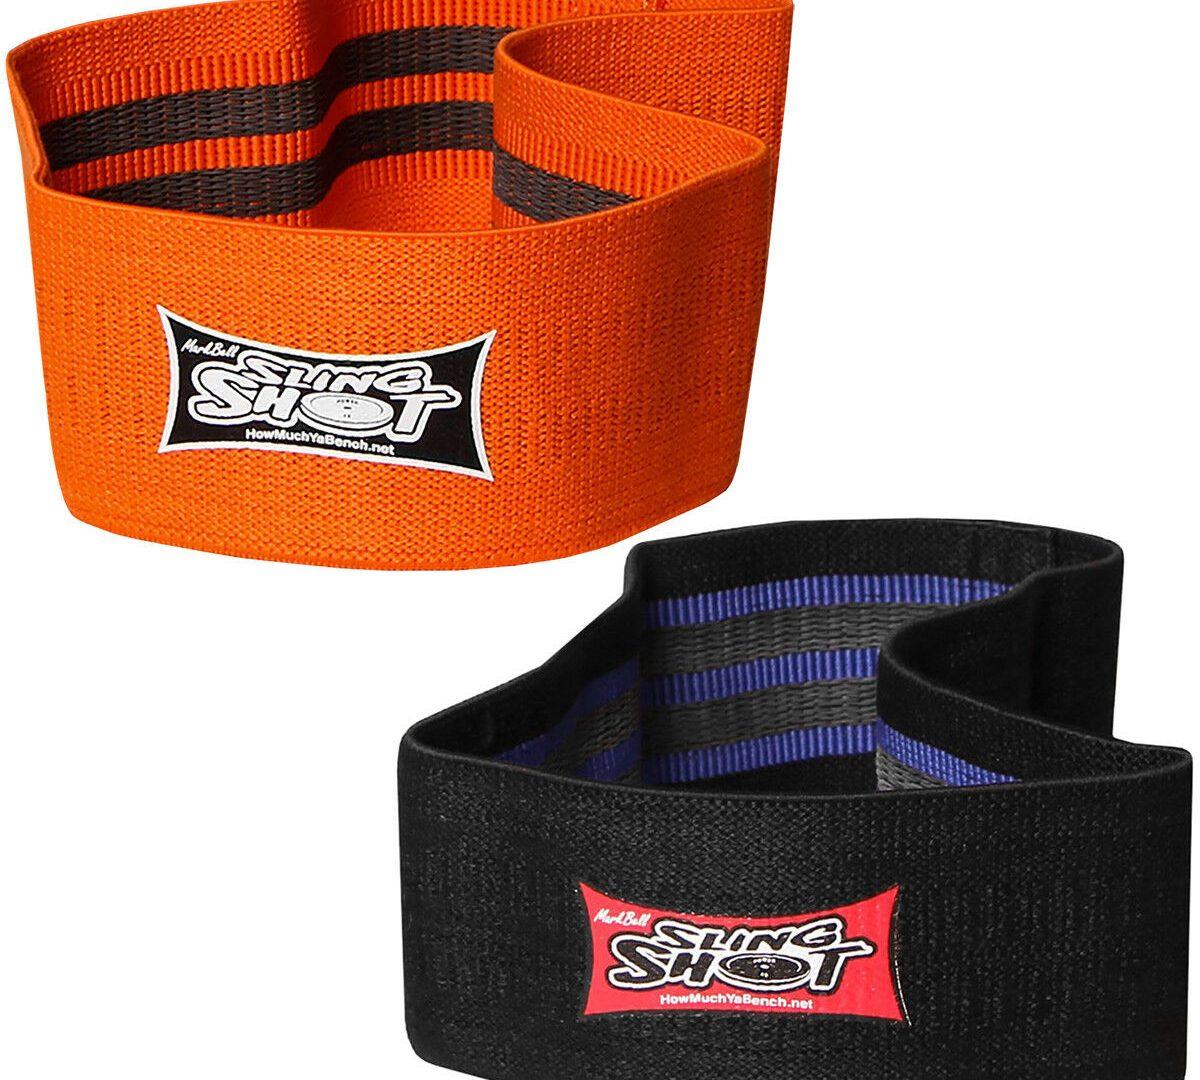 An orange and black colored slingshot band.